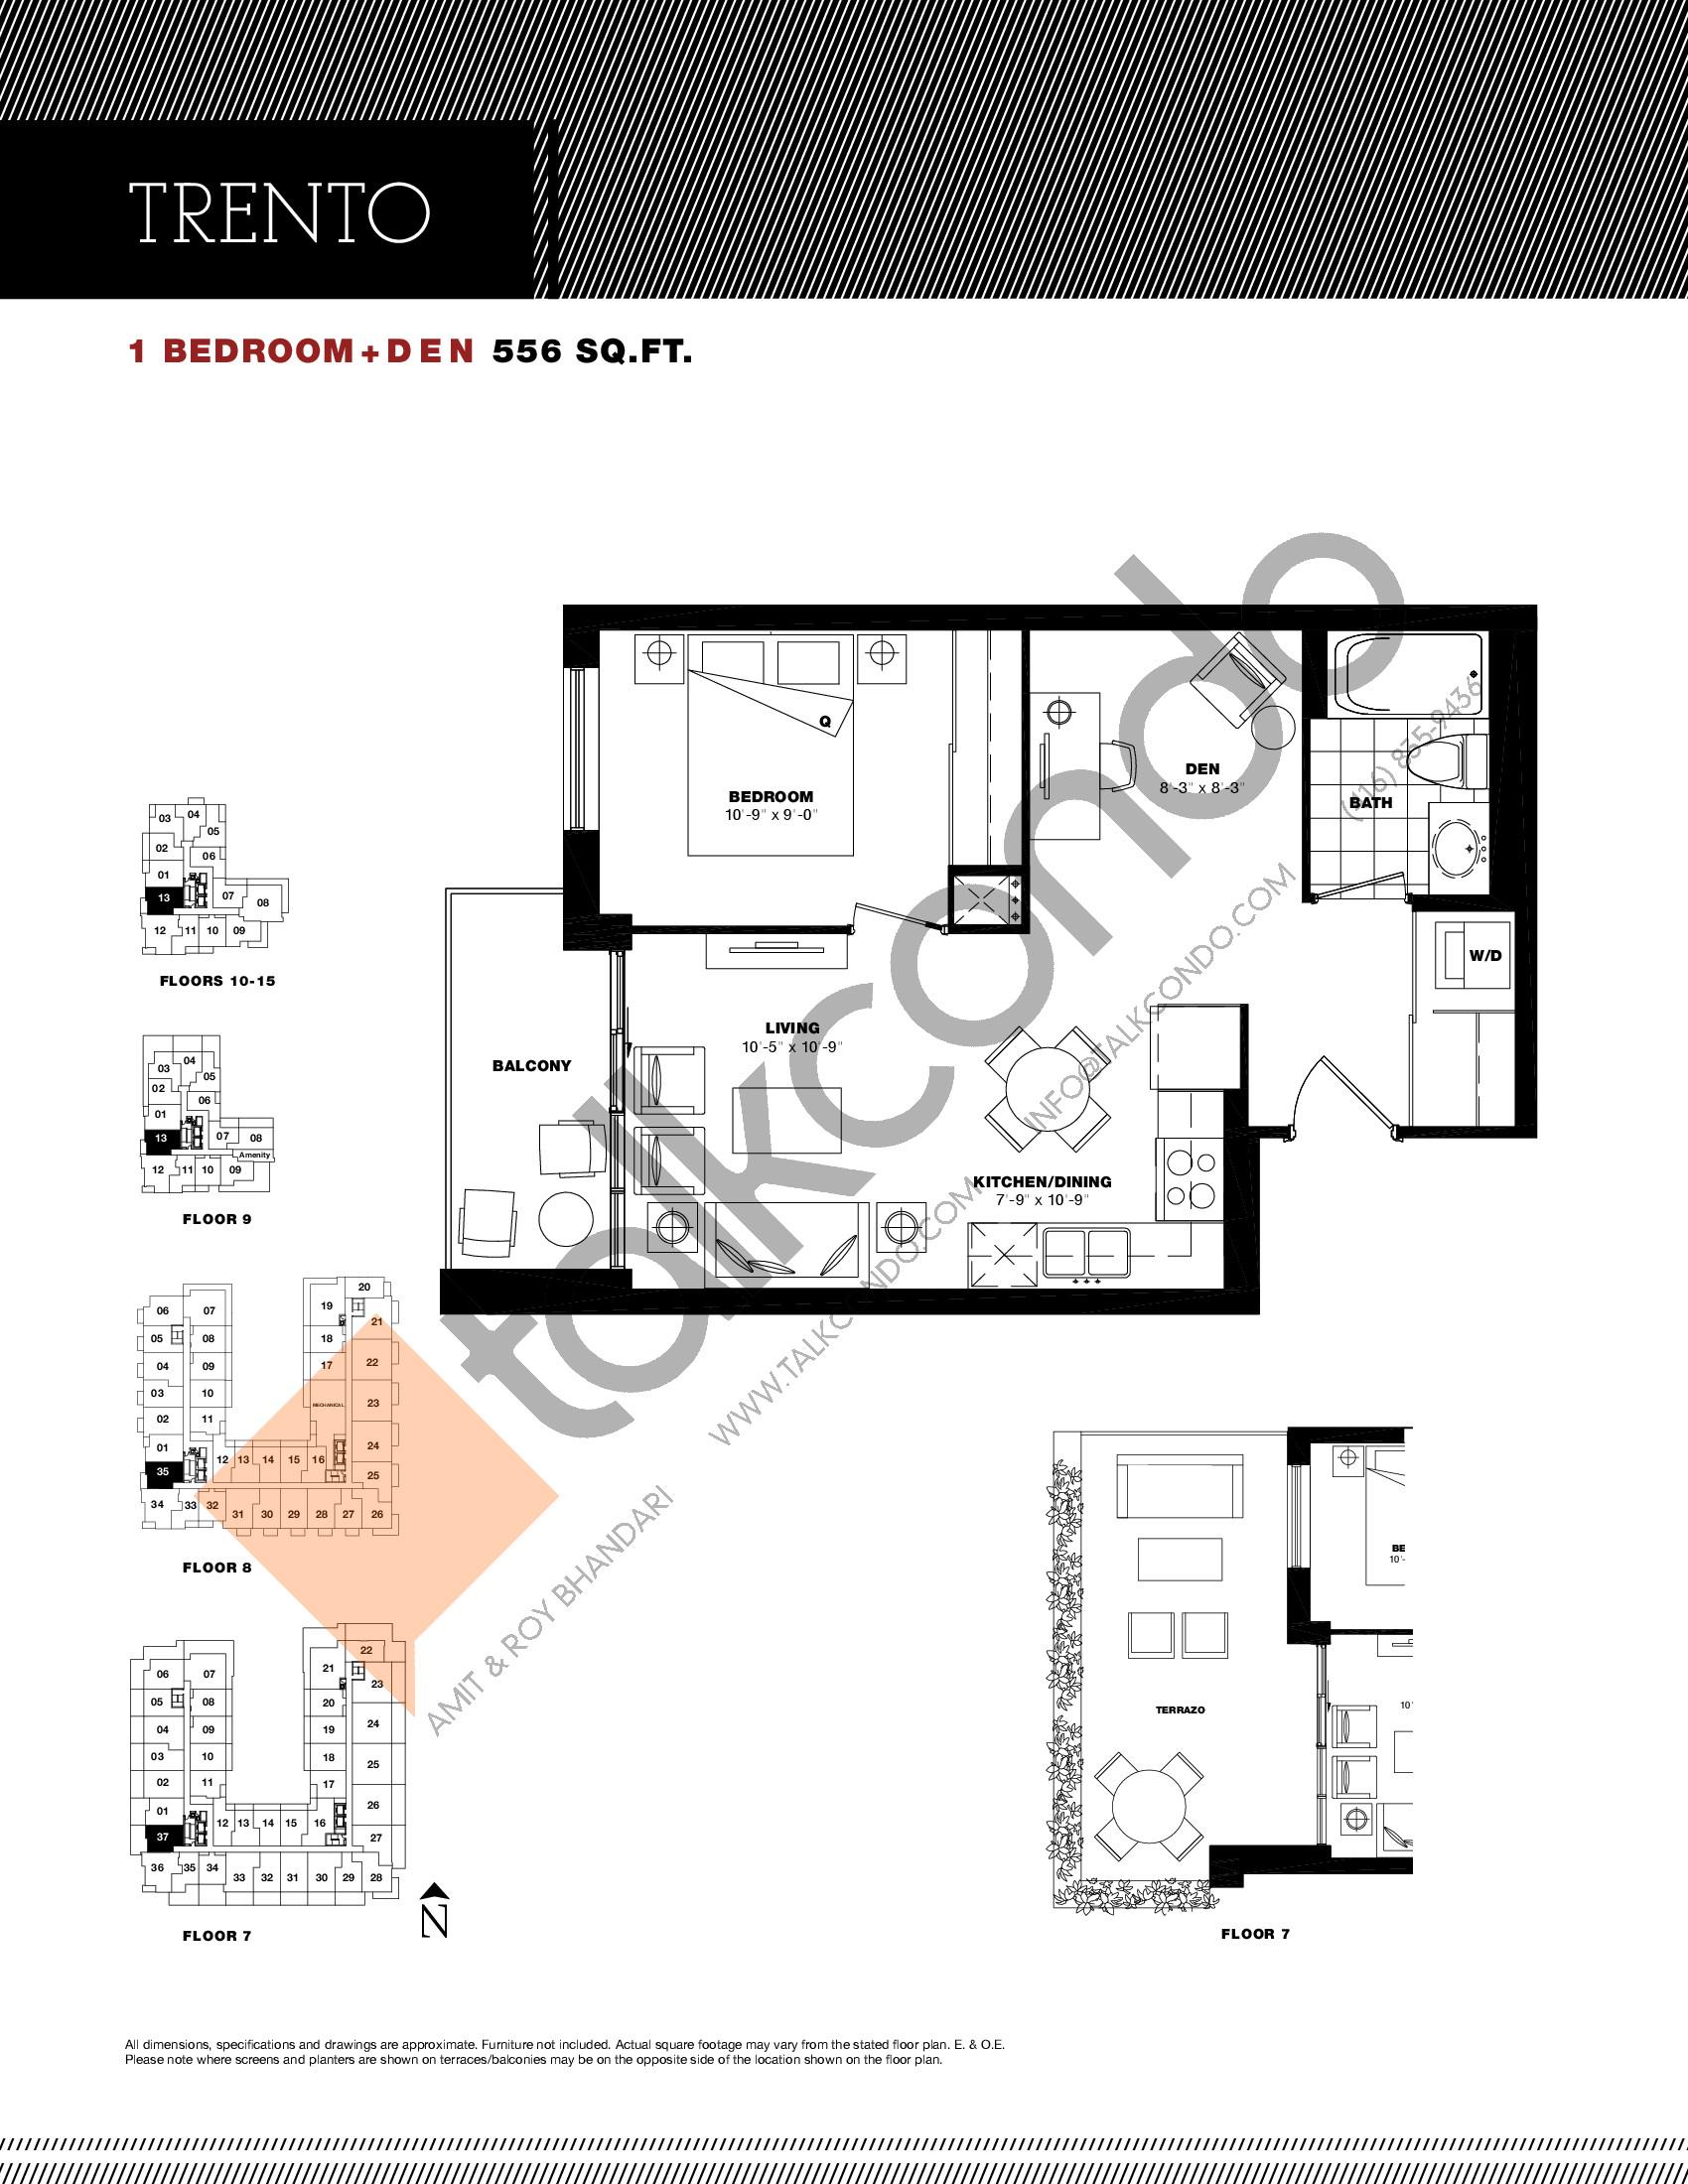 Trento Floor Plan at Residenze Palazzo at Treviso 3 Condos - 556 sq.ft